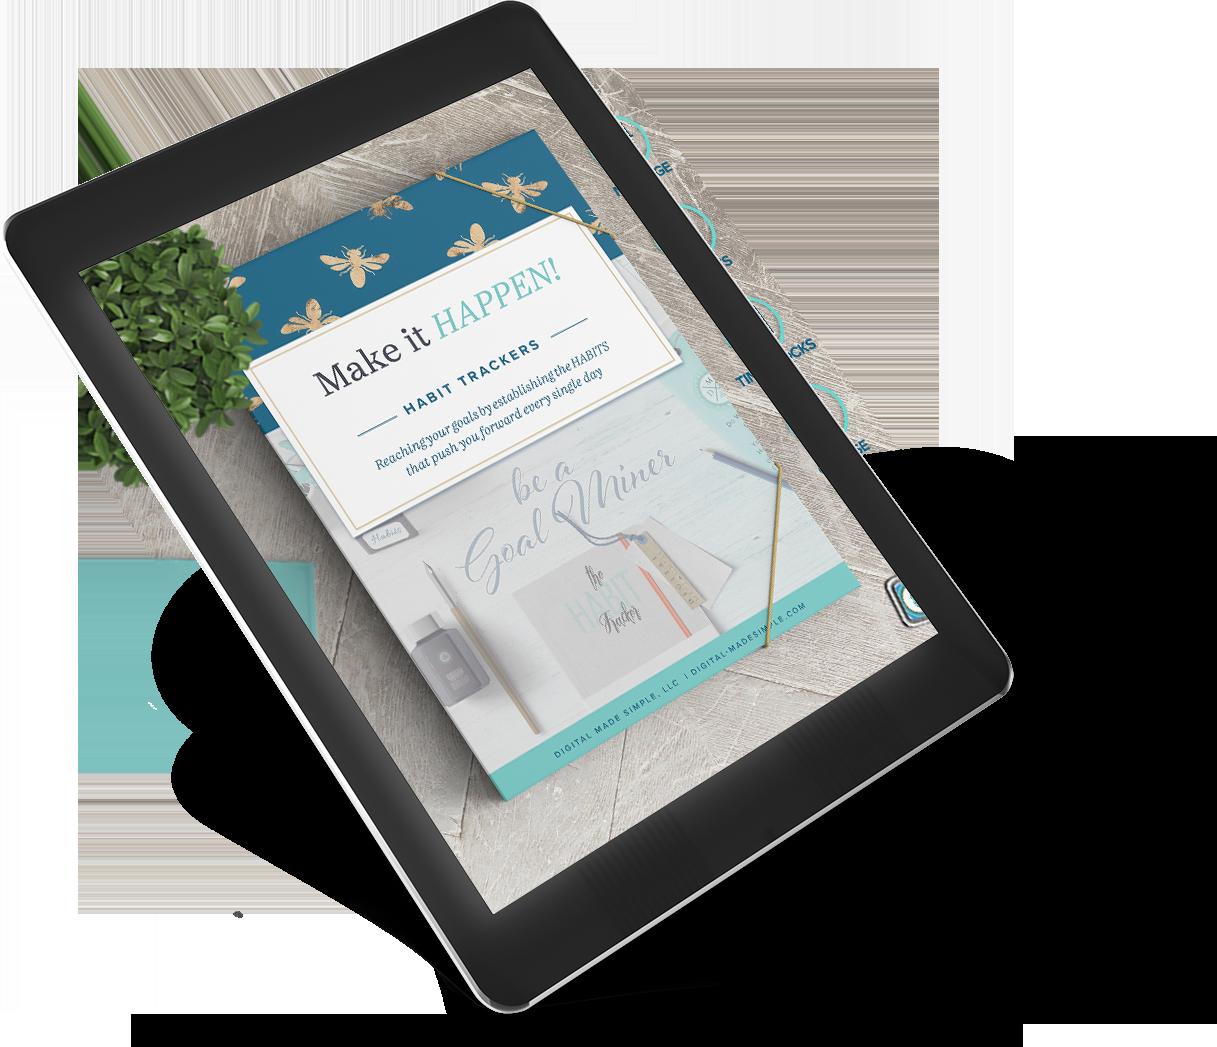 Habit Tracker Digital Planner, Digital Made Simple